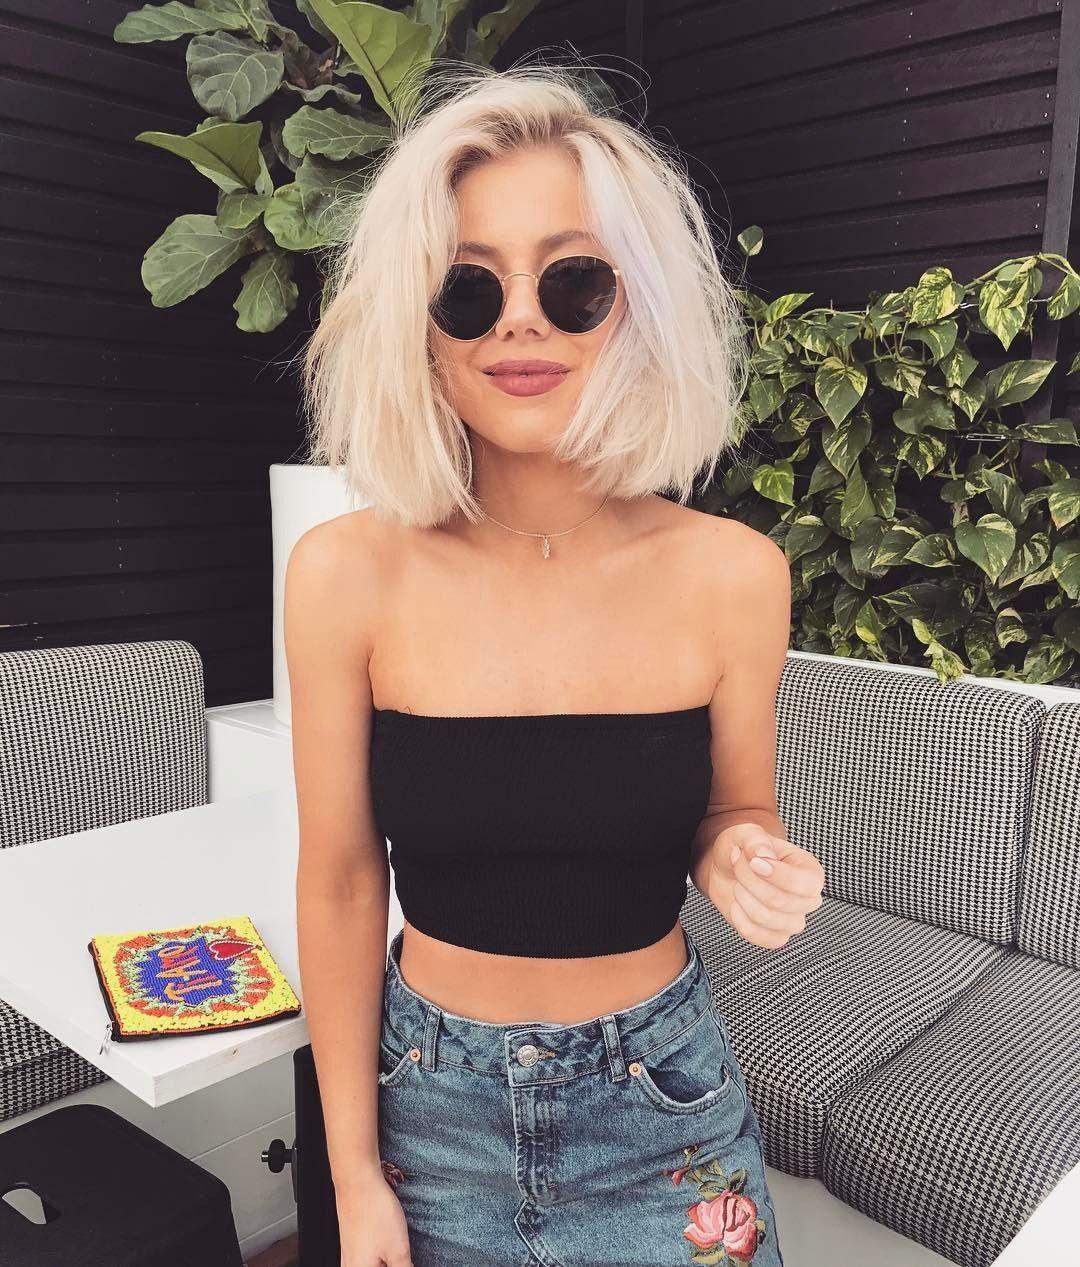 Laura jade stone laurajadestone u instagramfotos und videos